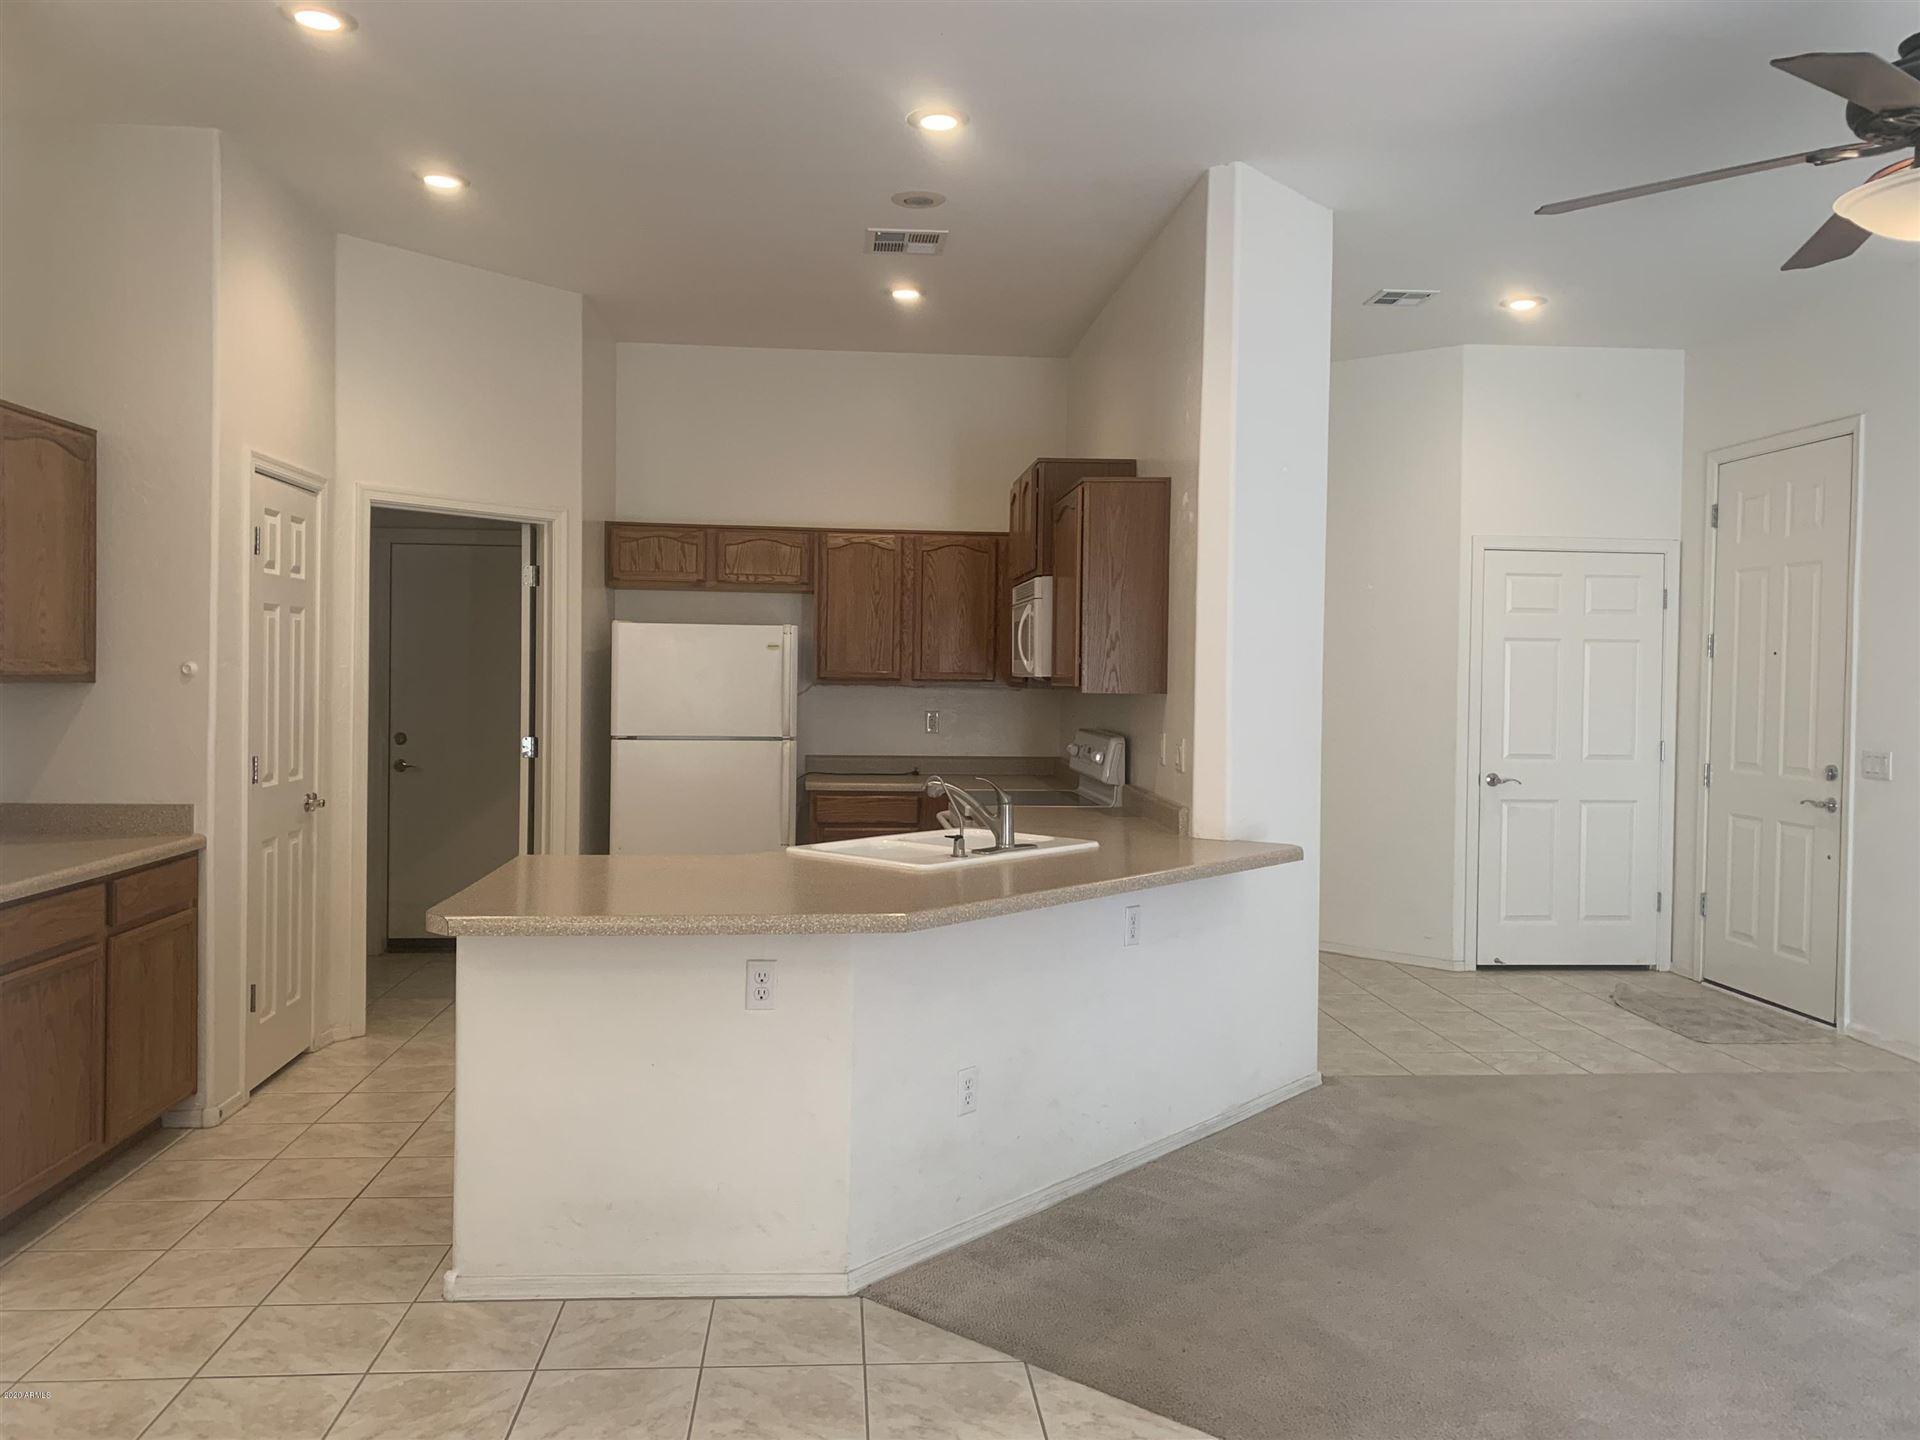 25 S QUINN Circle #57, Mesa, AZ 85206 - MLS#: 6112149